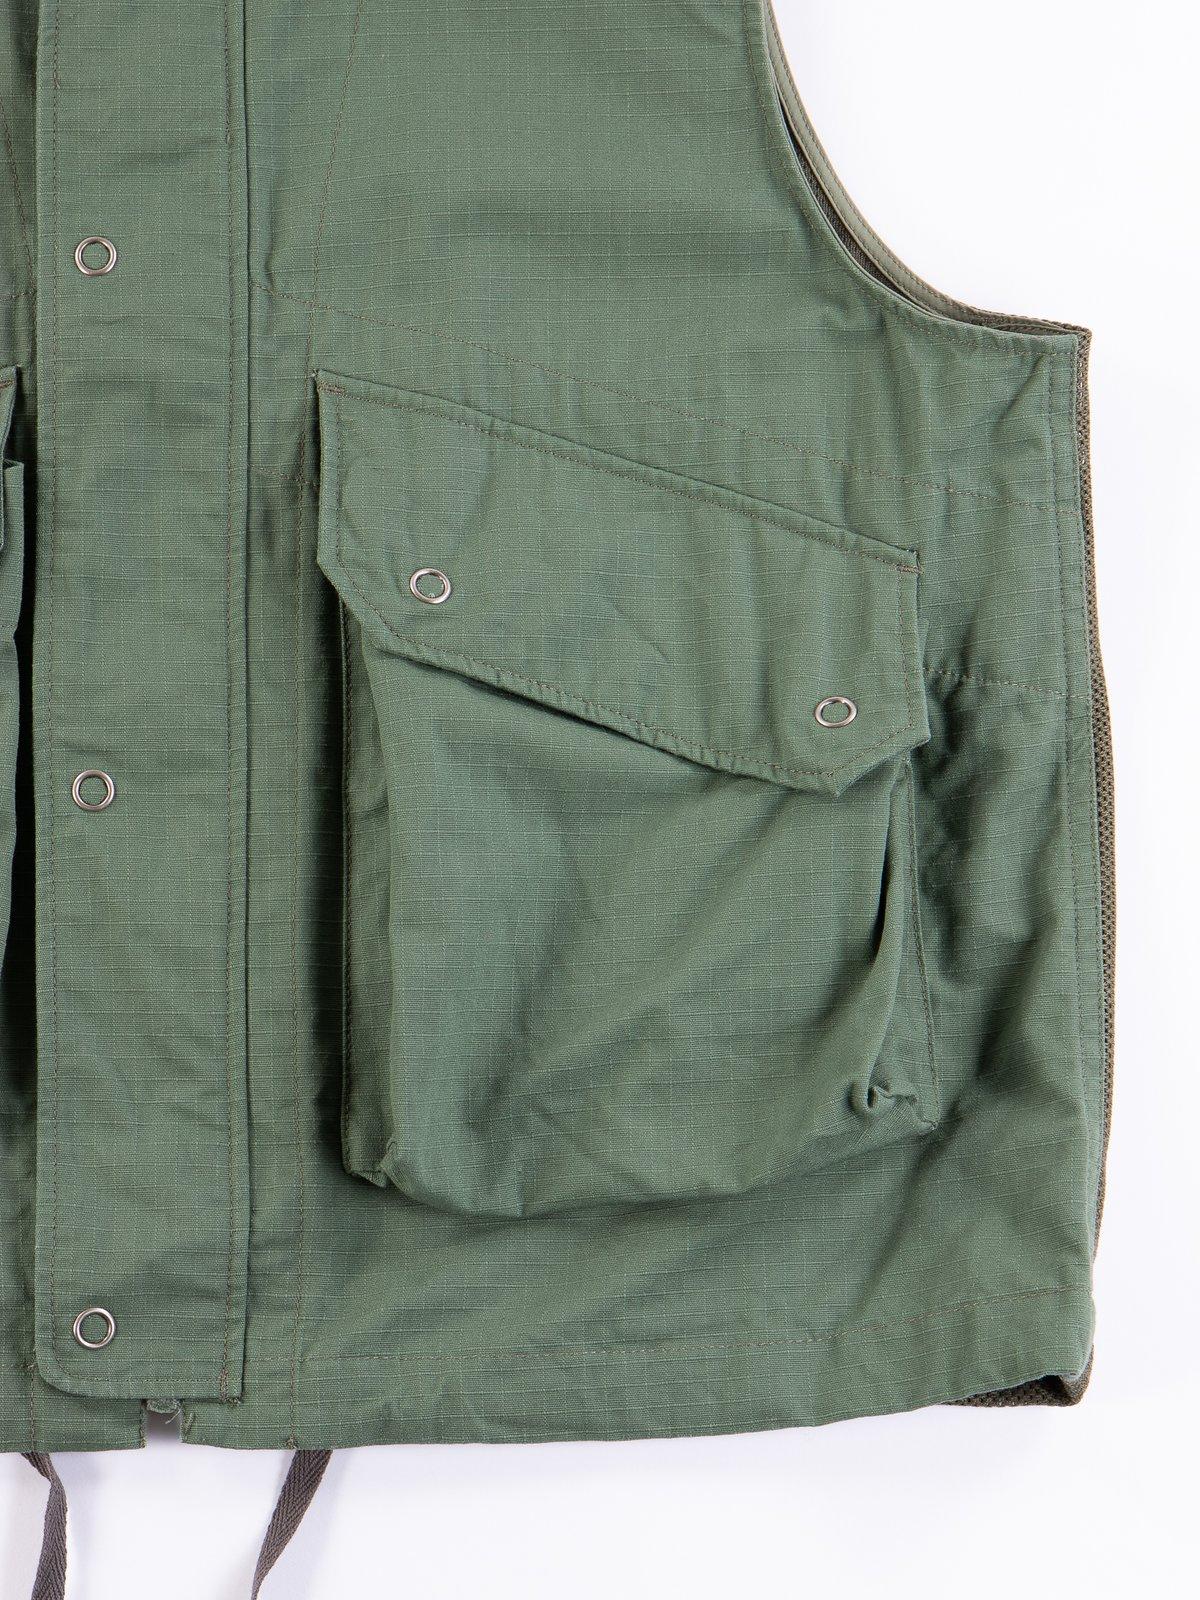 Olive Cotton Ripstop Field Vest - Image 4